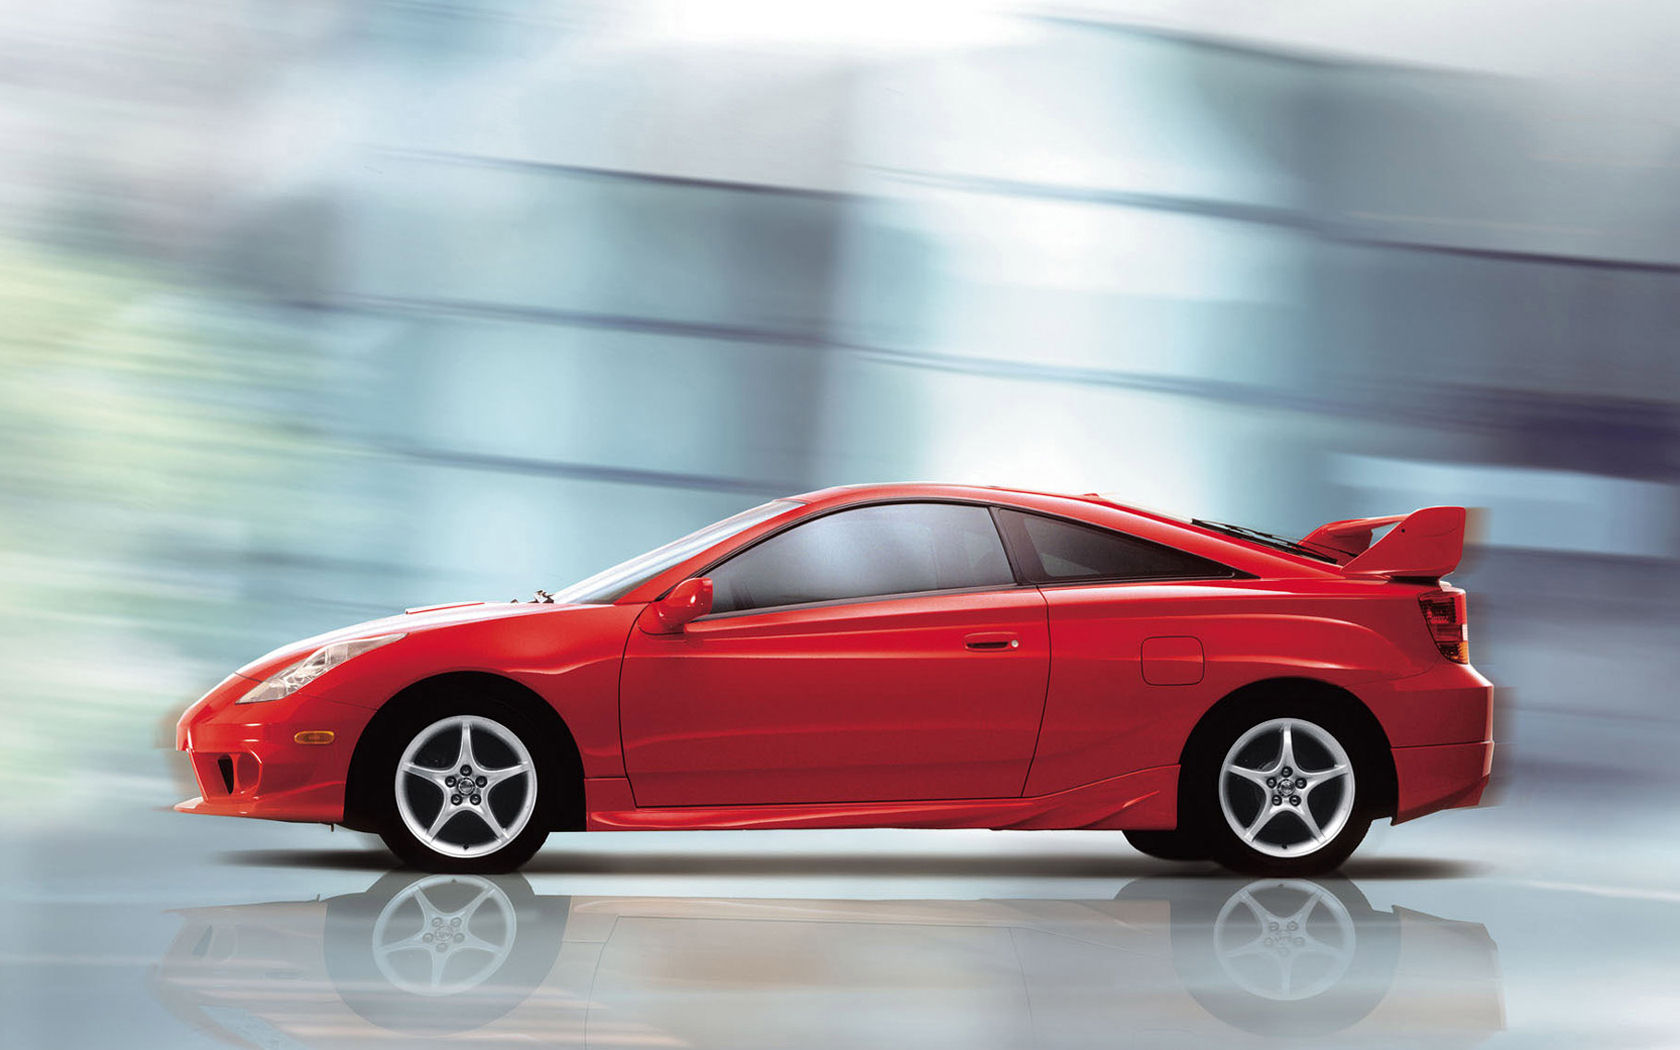 toyota celica gt gts free widescreen wallpaper desktop rh jbcarpages com 1999 Toyota Celica GT Toyota Celica GTS Interior